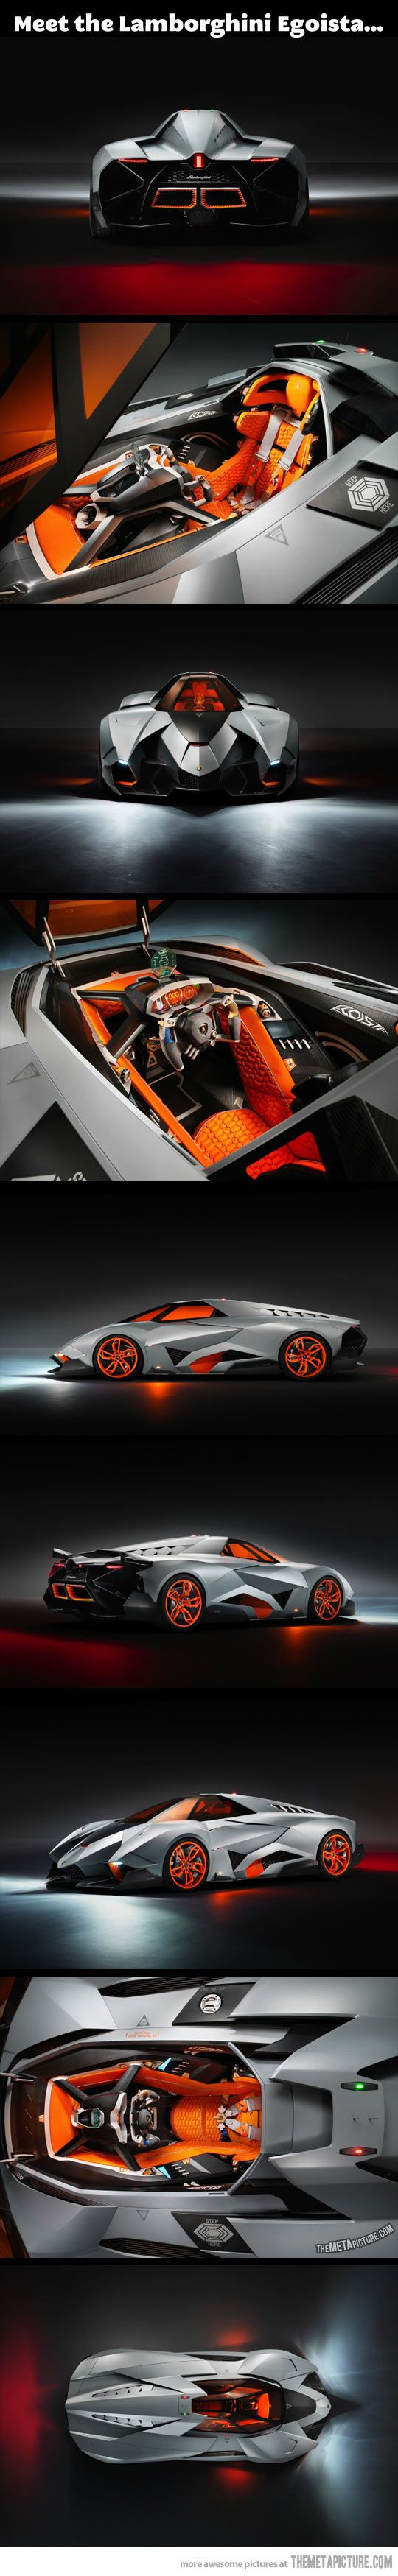 Forget The Batmobile I Want The Lamborghini Egoista Lamborghini